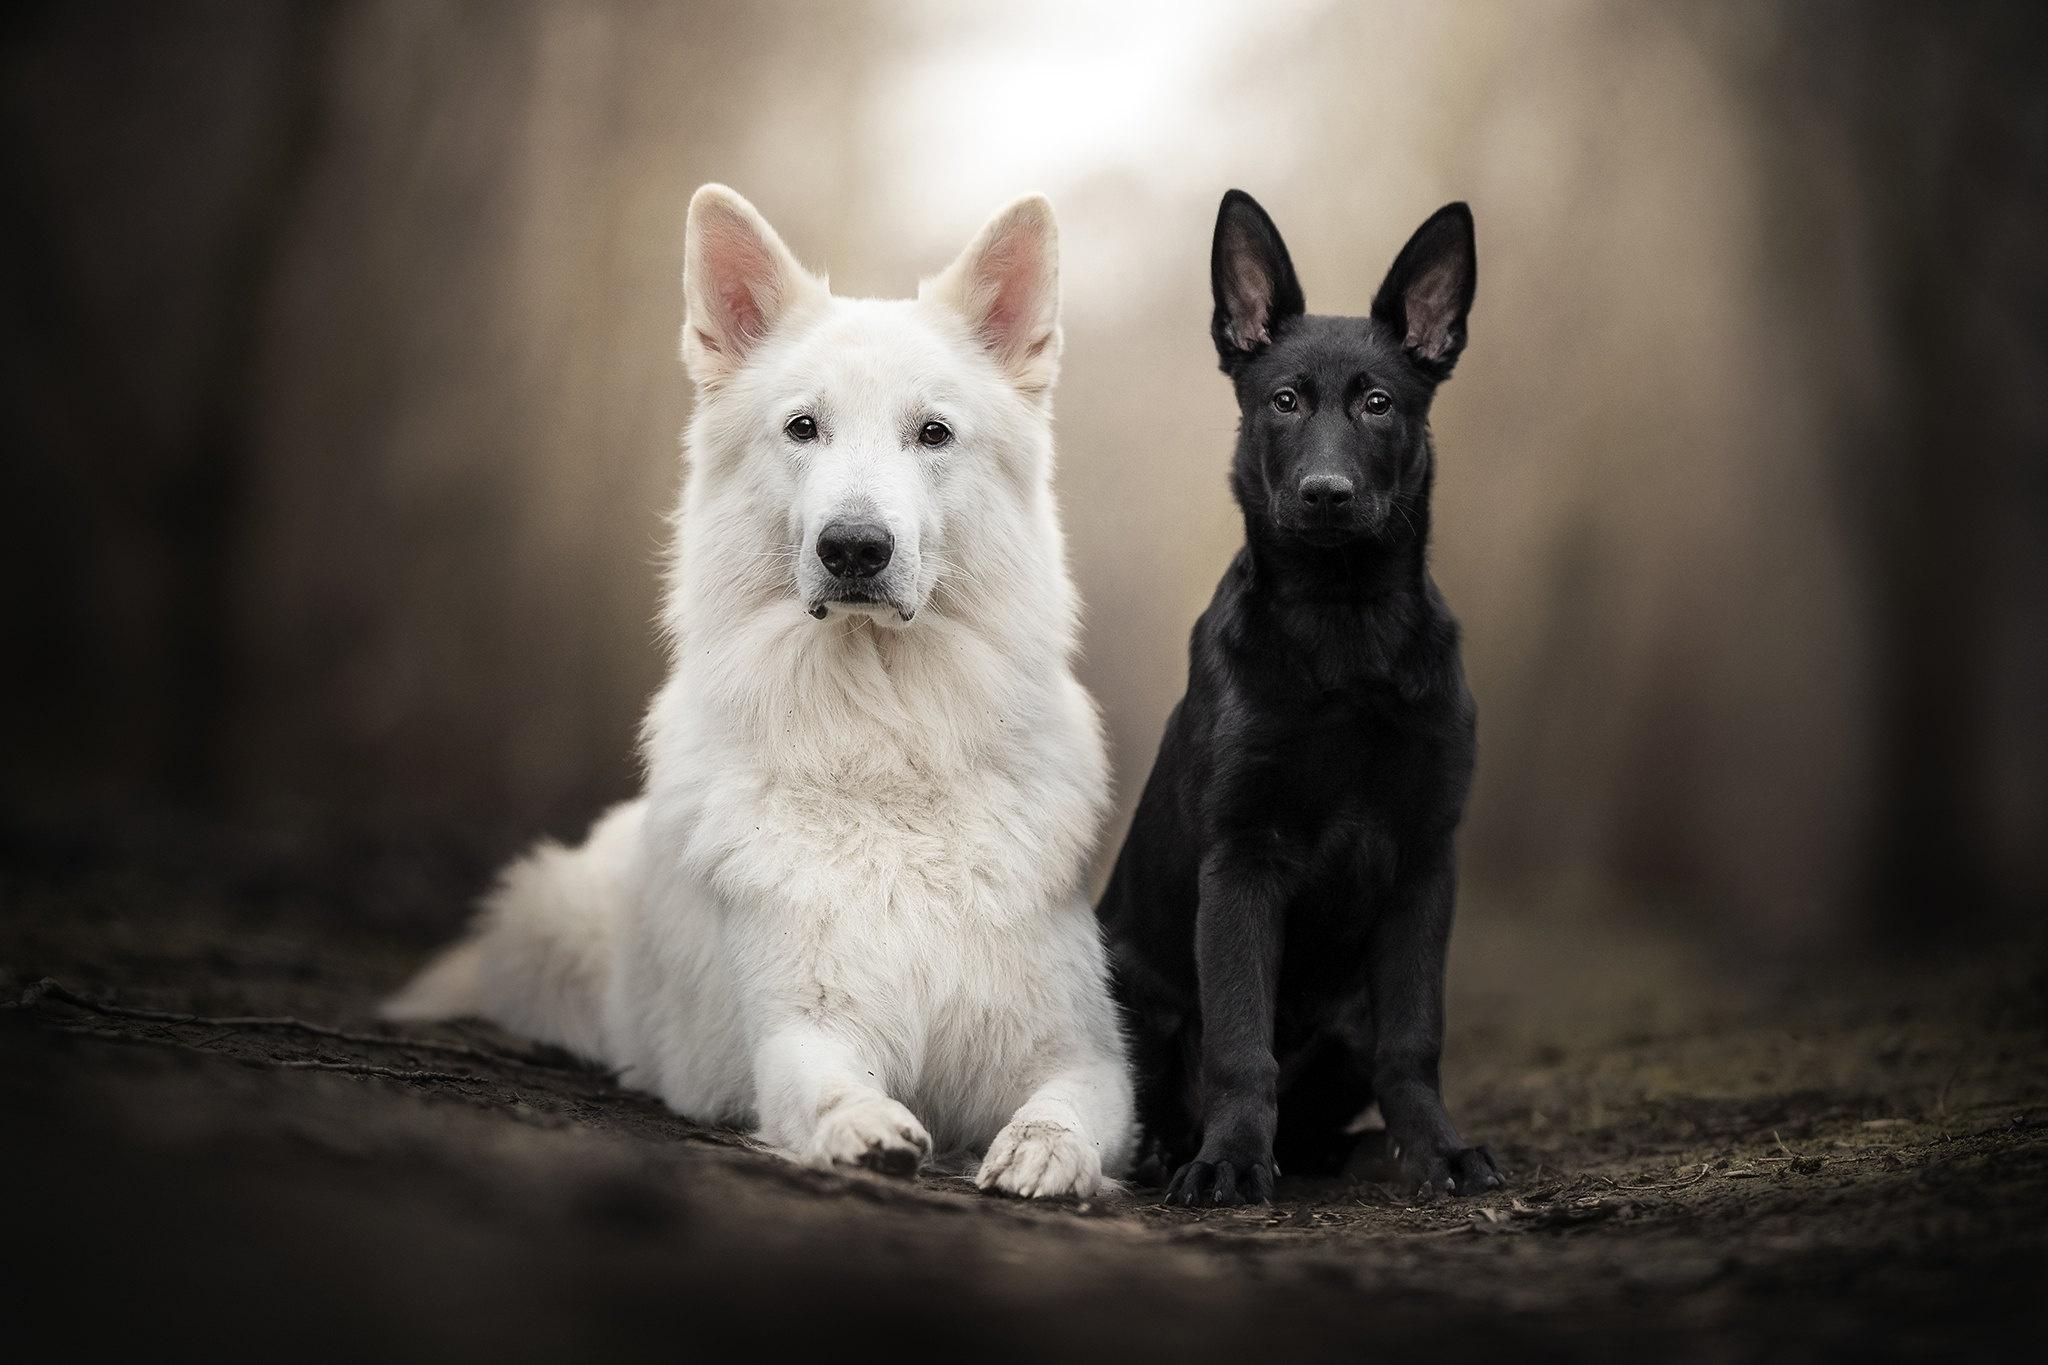 Baby Animal German Shepherd Pet Puppy Swiss Shepherd 2048x1365